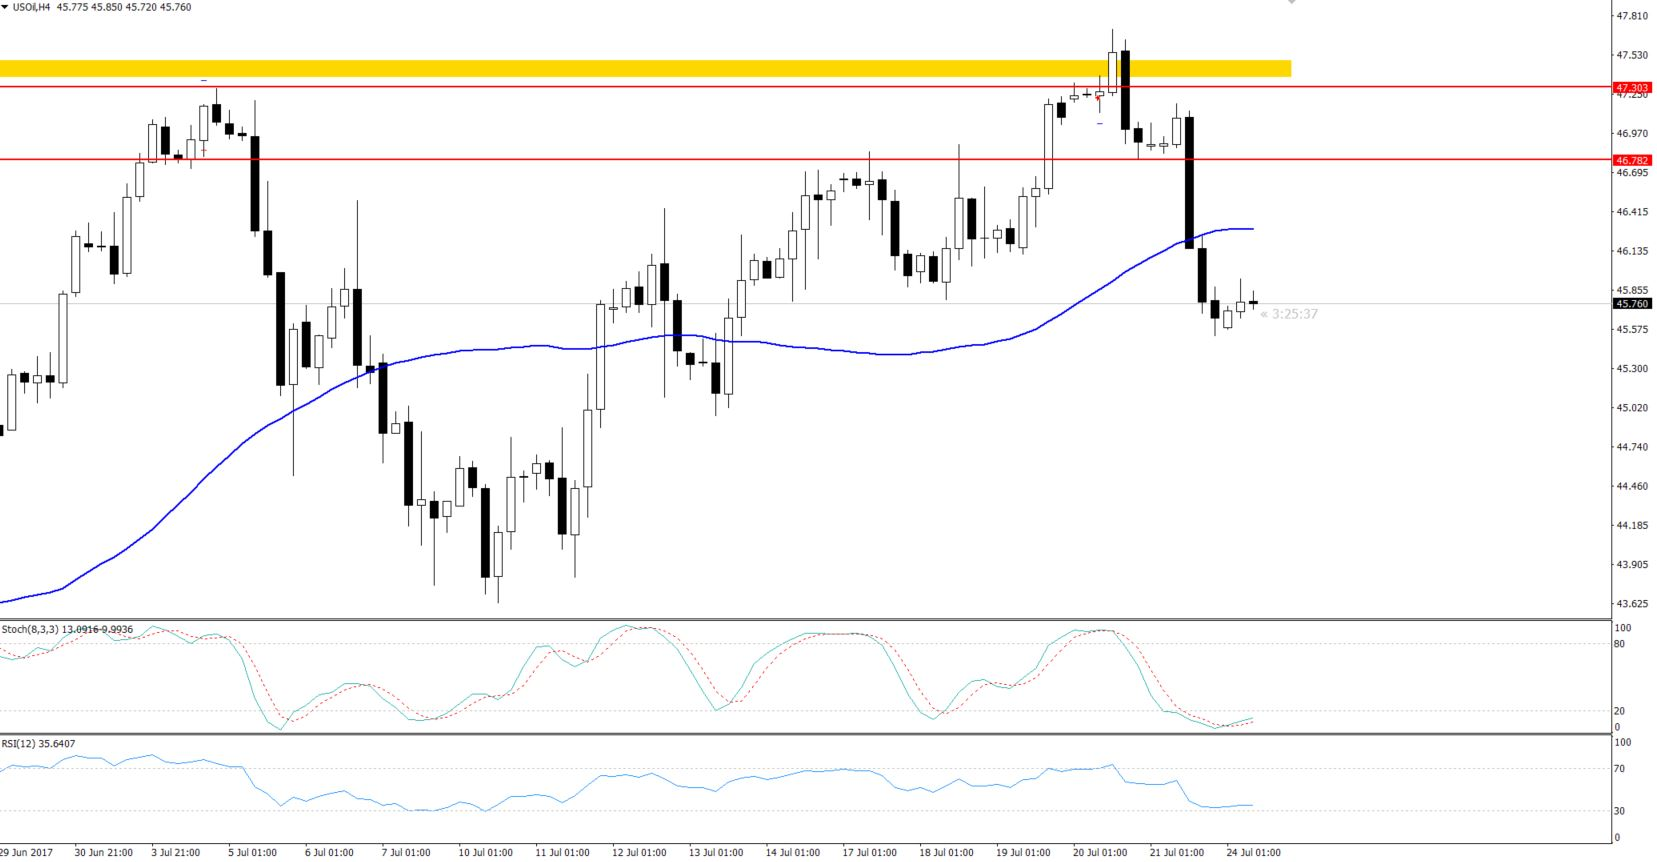 WTI Crude Oil - 4 - Hours Chart - Oversold Indicators